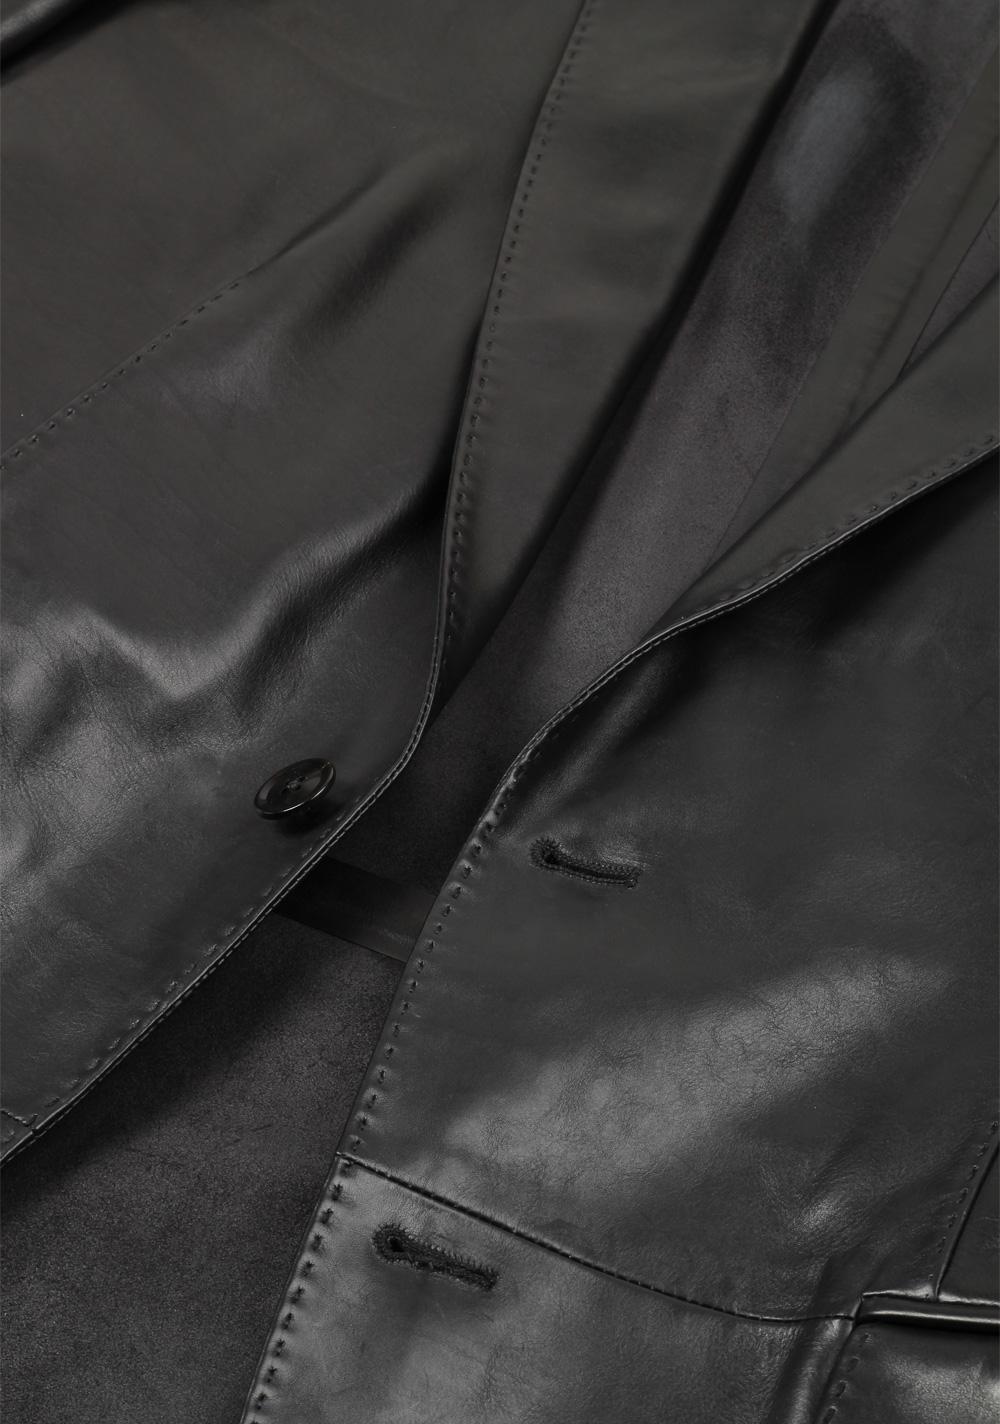 TOM FORD Black Nappa Leather Jacket Coat Size 48 / 38R U.S. | Costume Limité